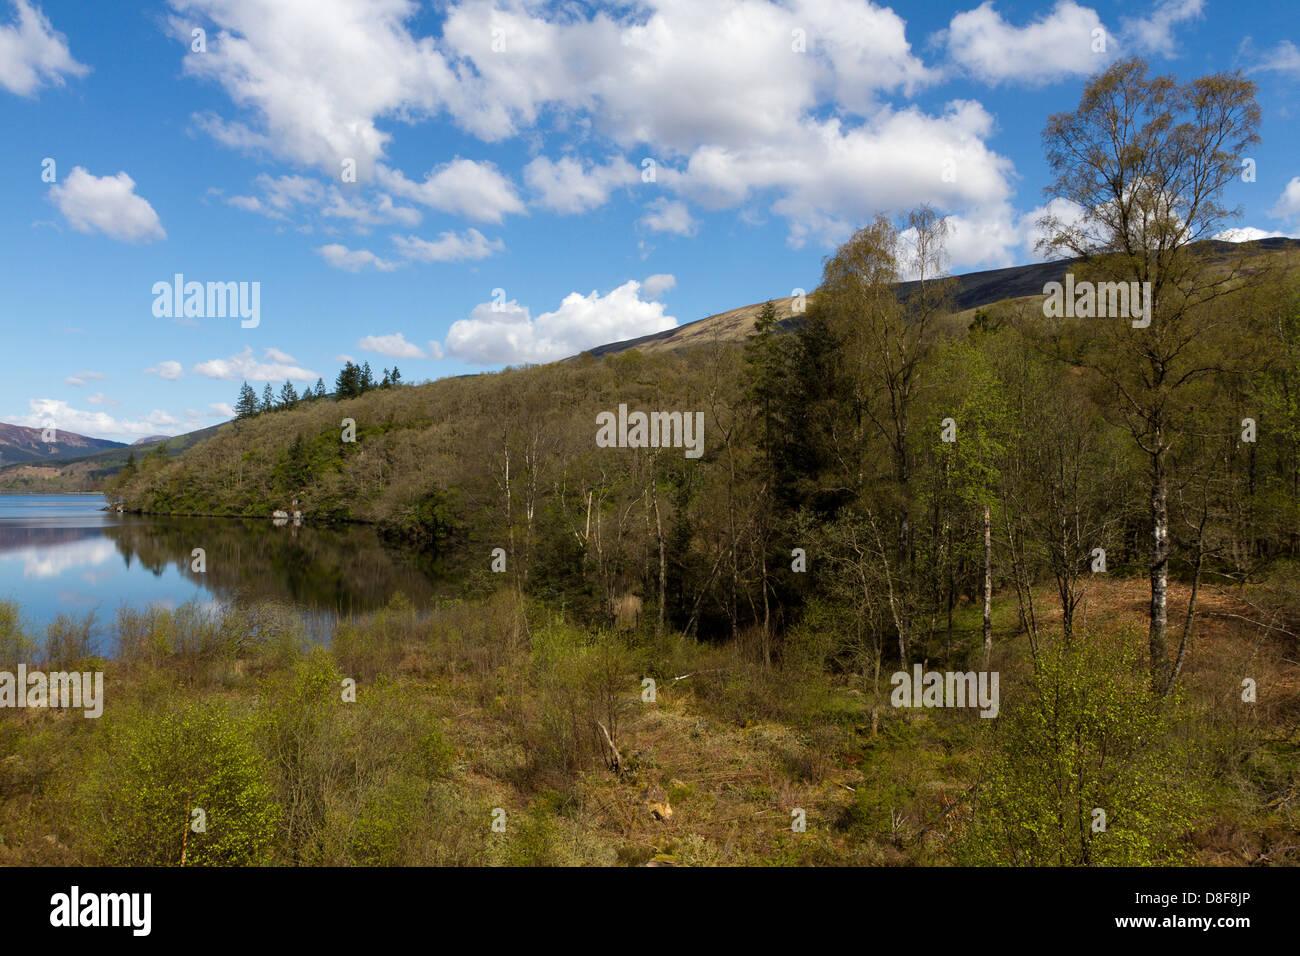 Loch Ard with Ben Lomond in the background, Loch Lomond & The Trossachs National Park, Stirling, Scotland, UK - Stock Image